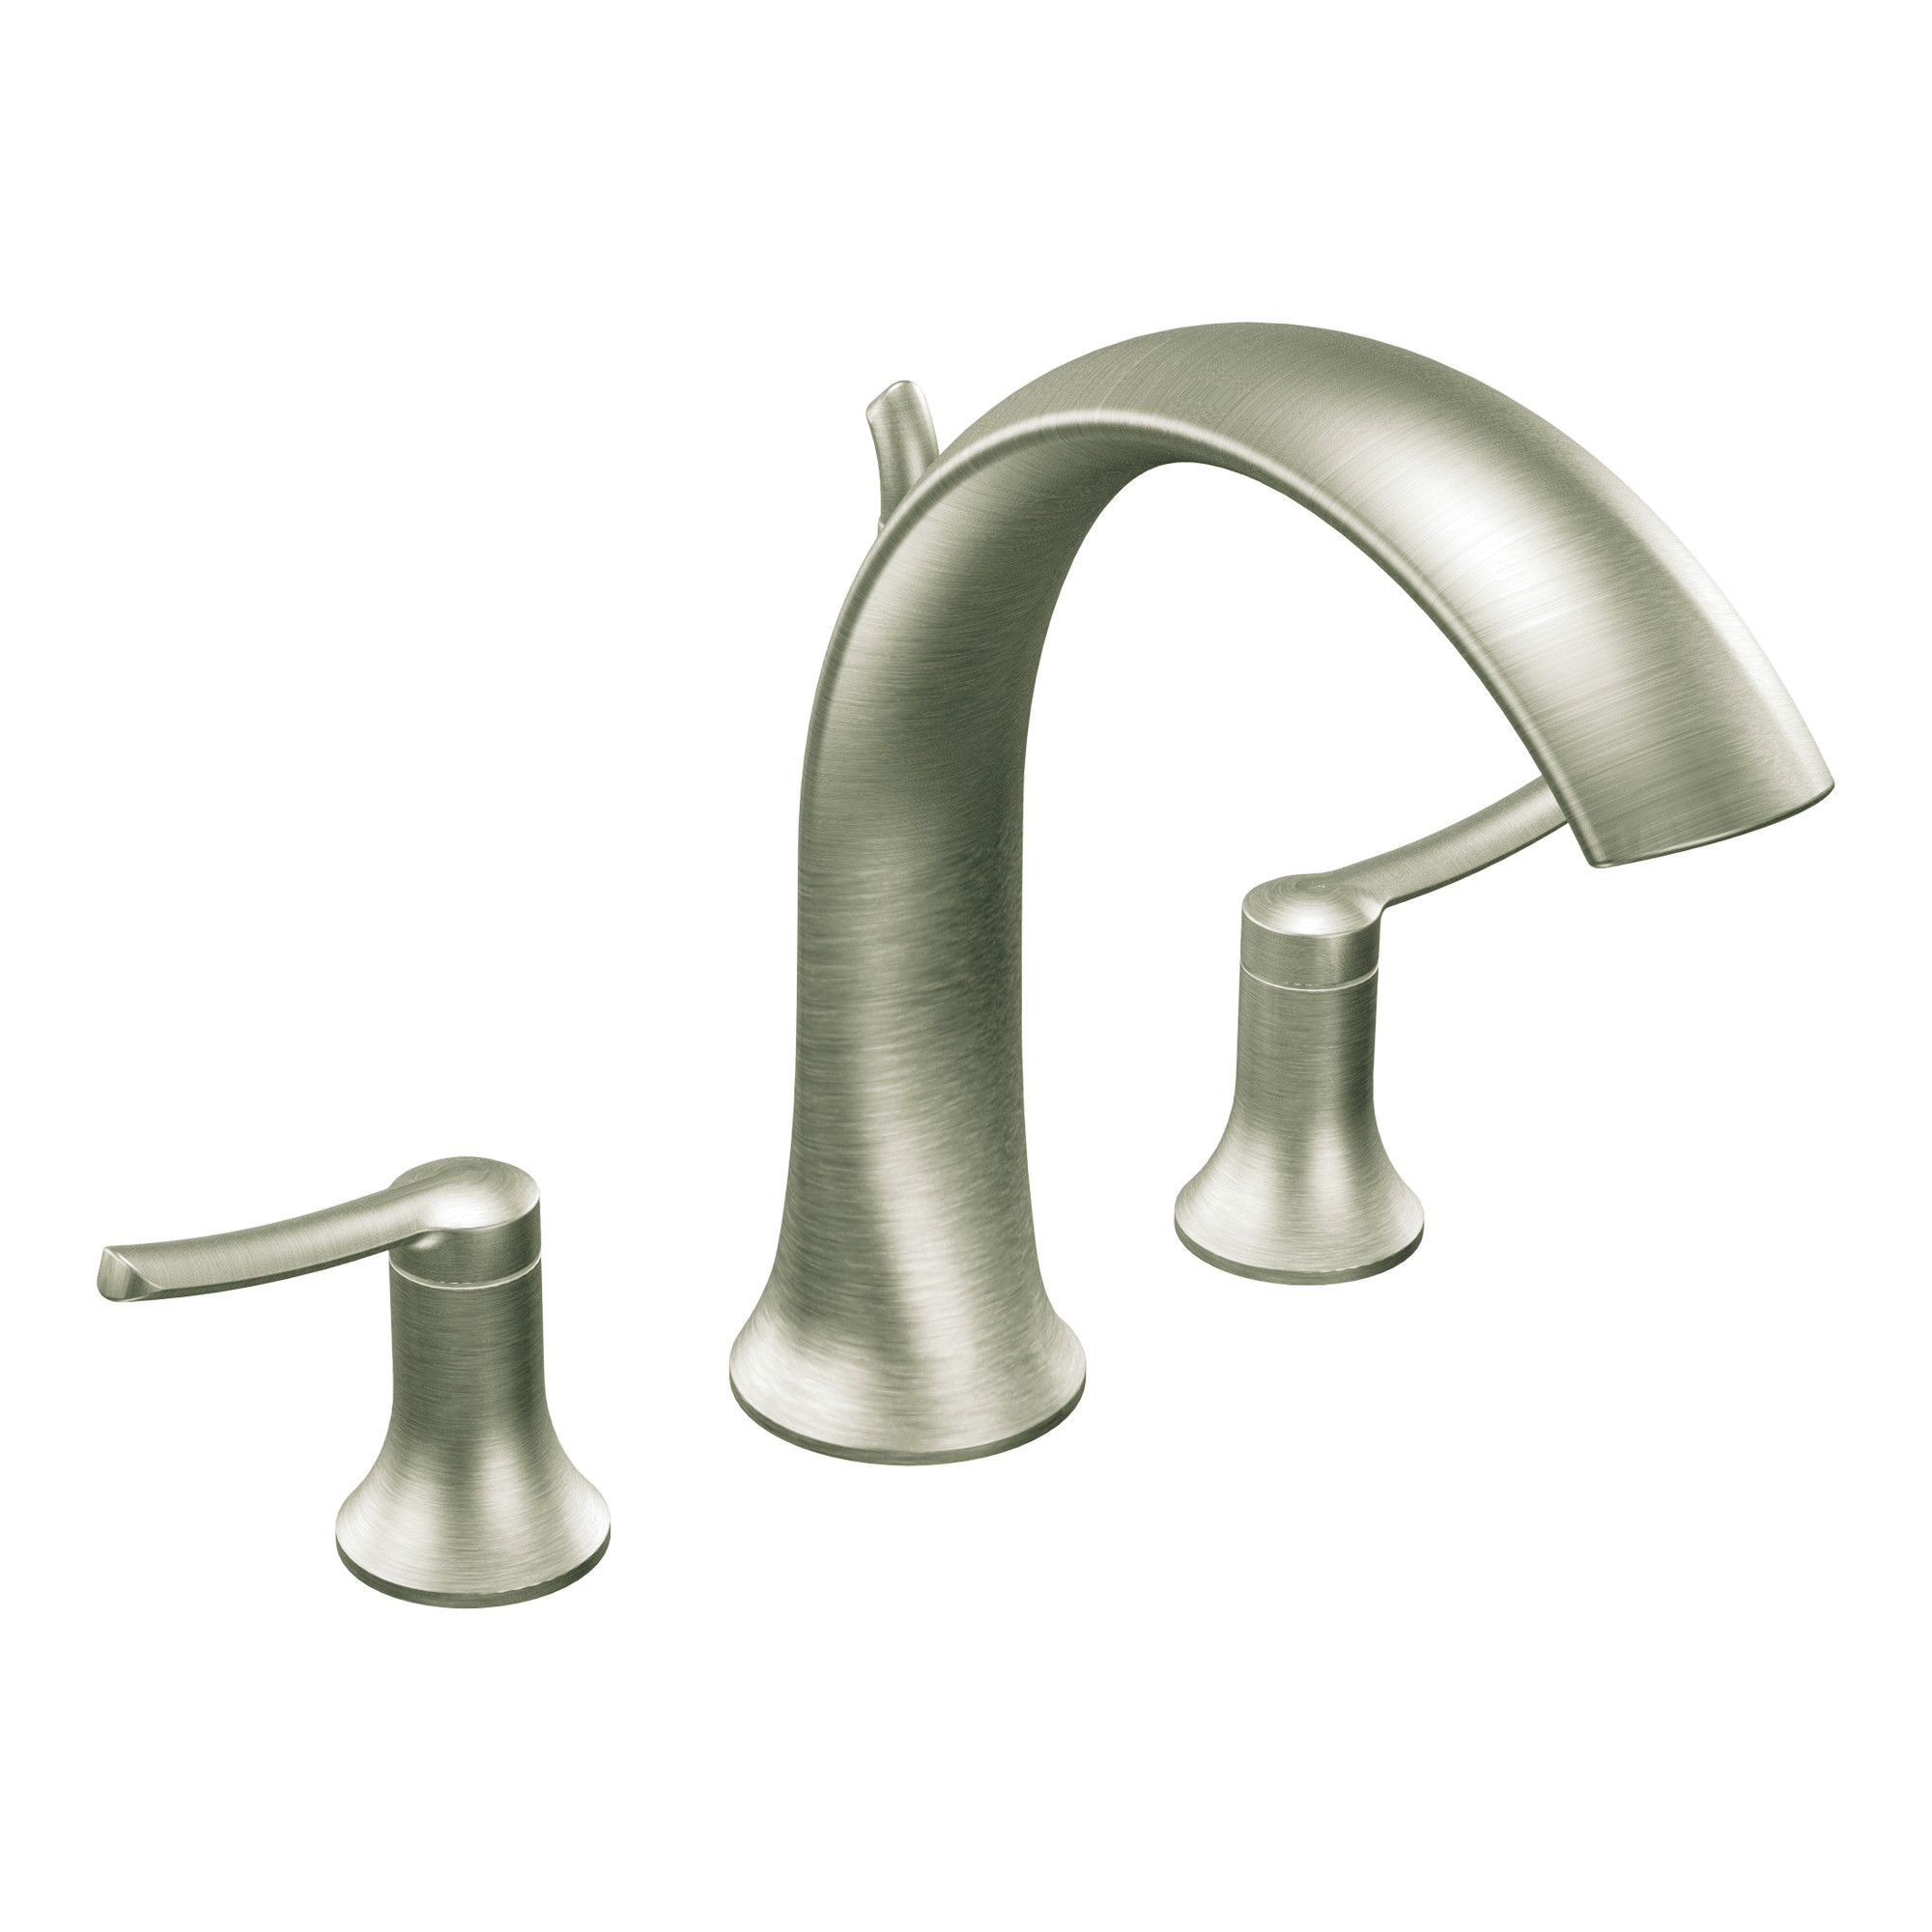 Moen Brushed Nickel Two Handle High Arc Roman Tub Faucet